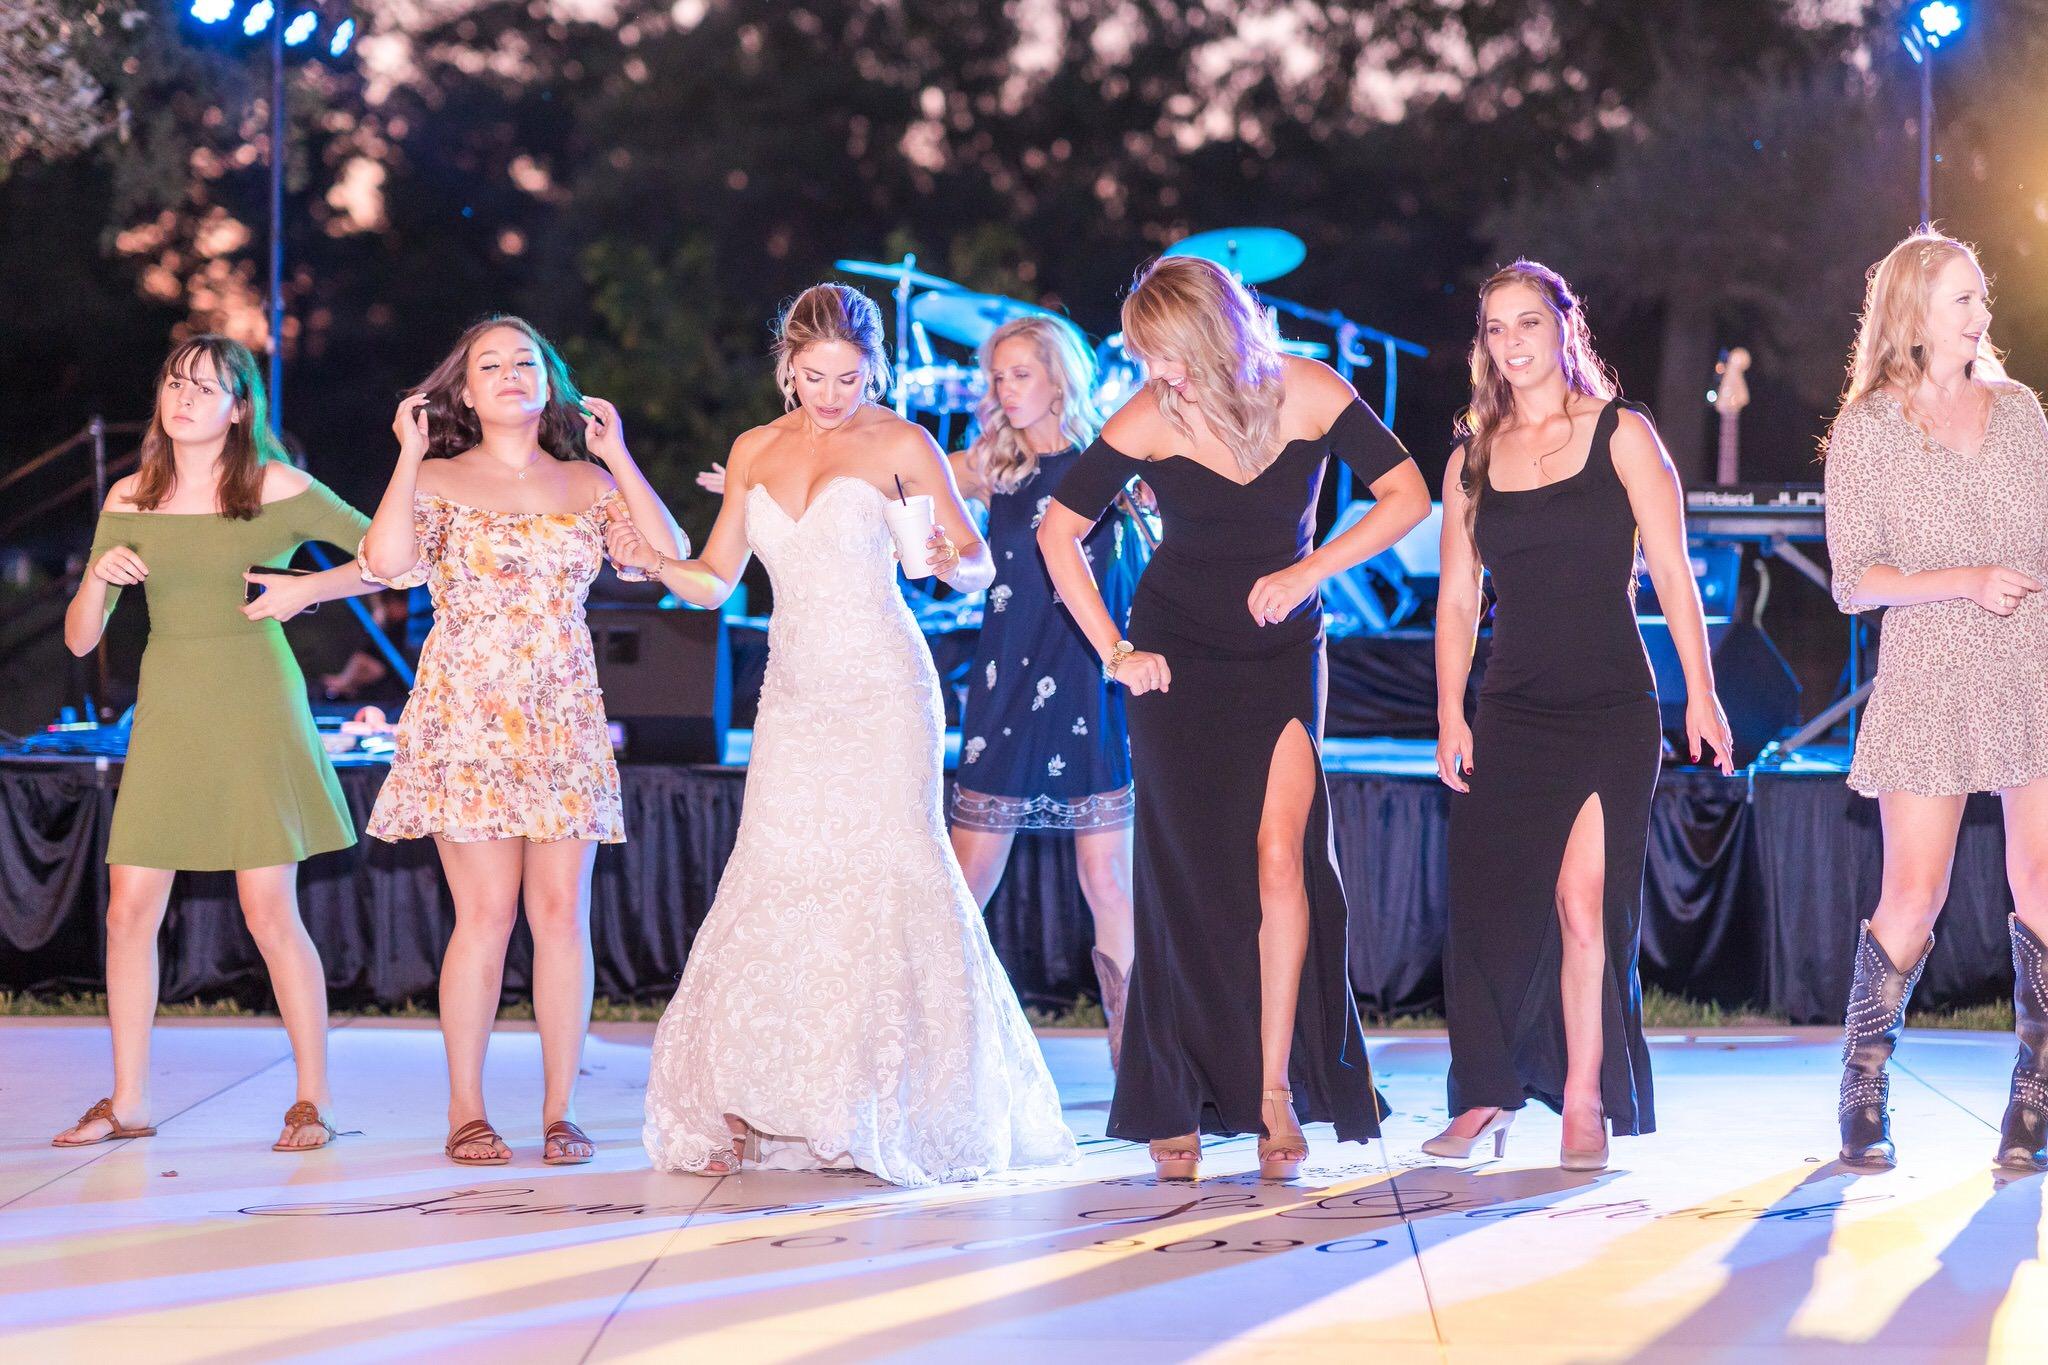 Wedding-In-Beeville-TX-McDavid-Dawn-Eliz